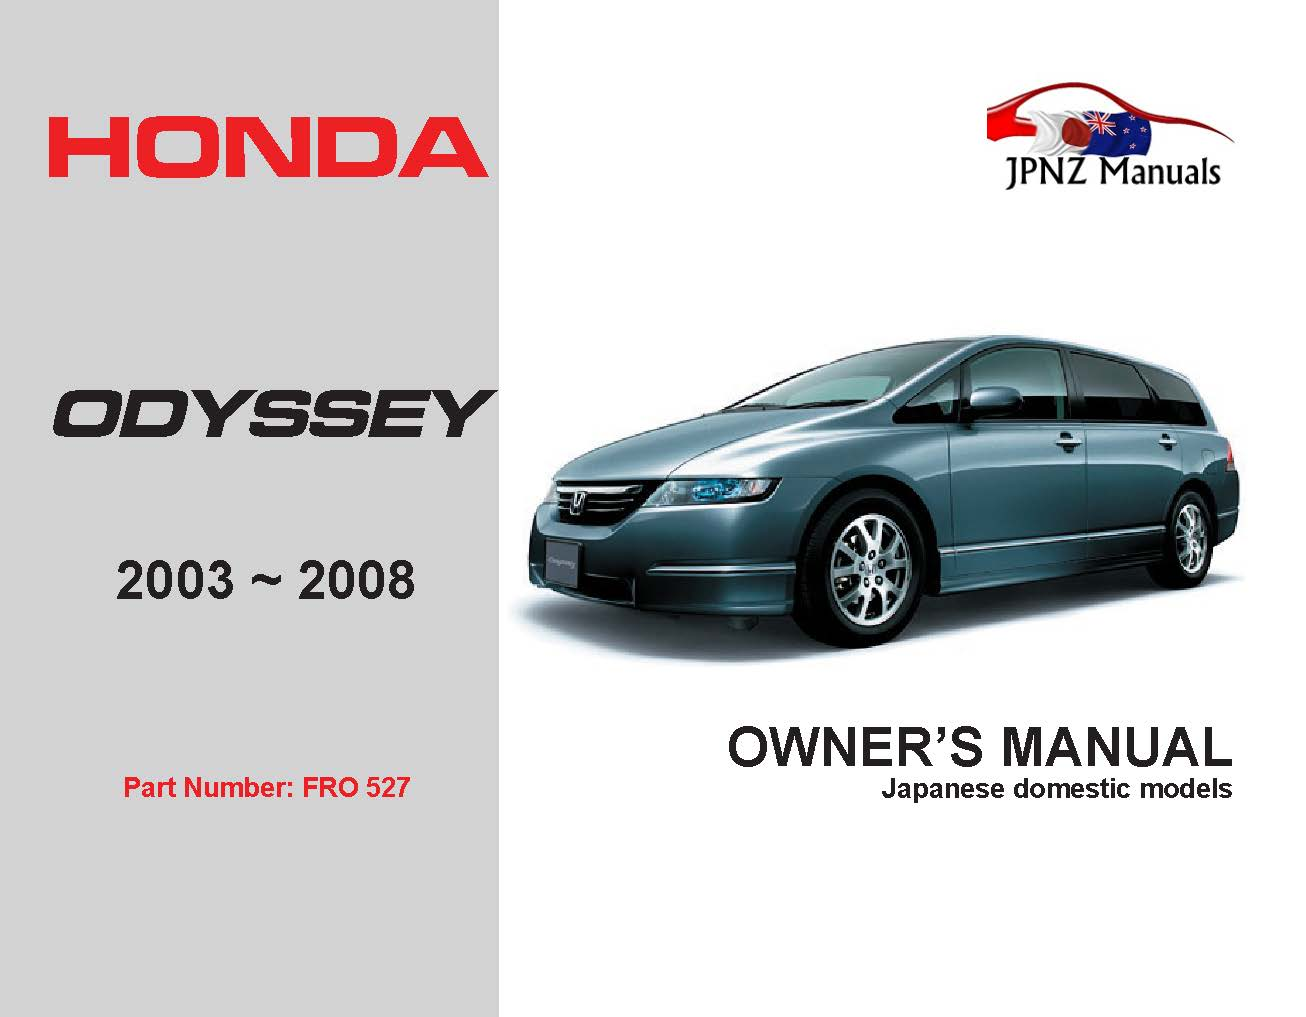 Honda - Odyssey Car Owners User Manual In English   2003 - 2008